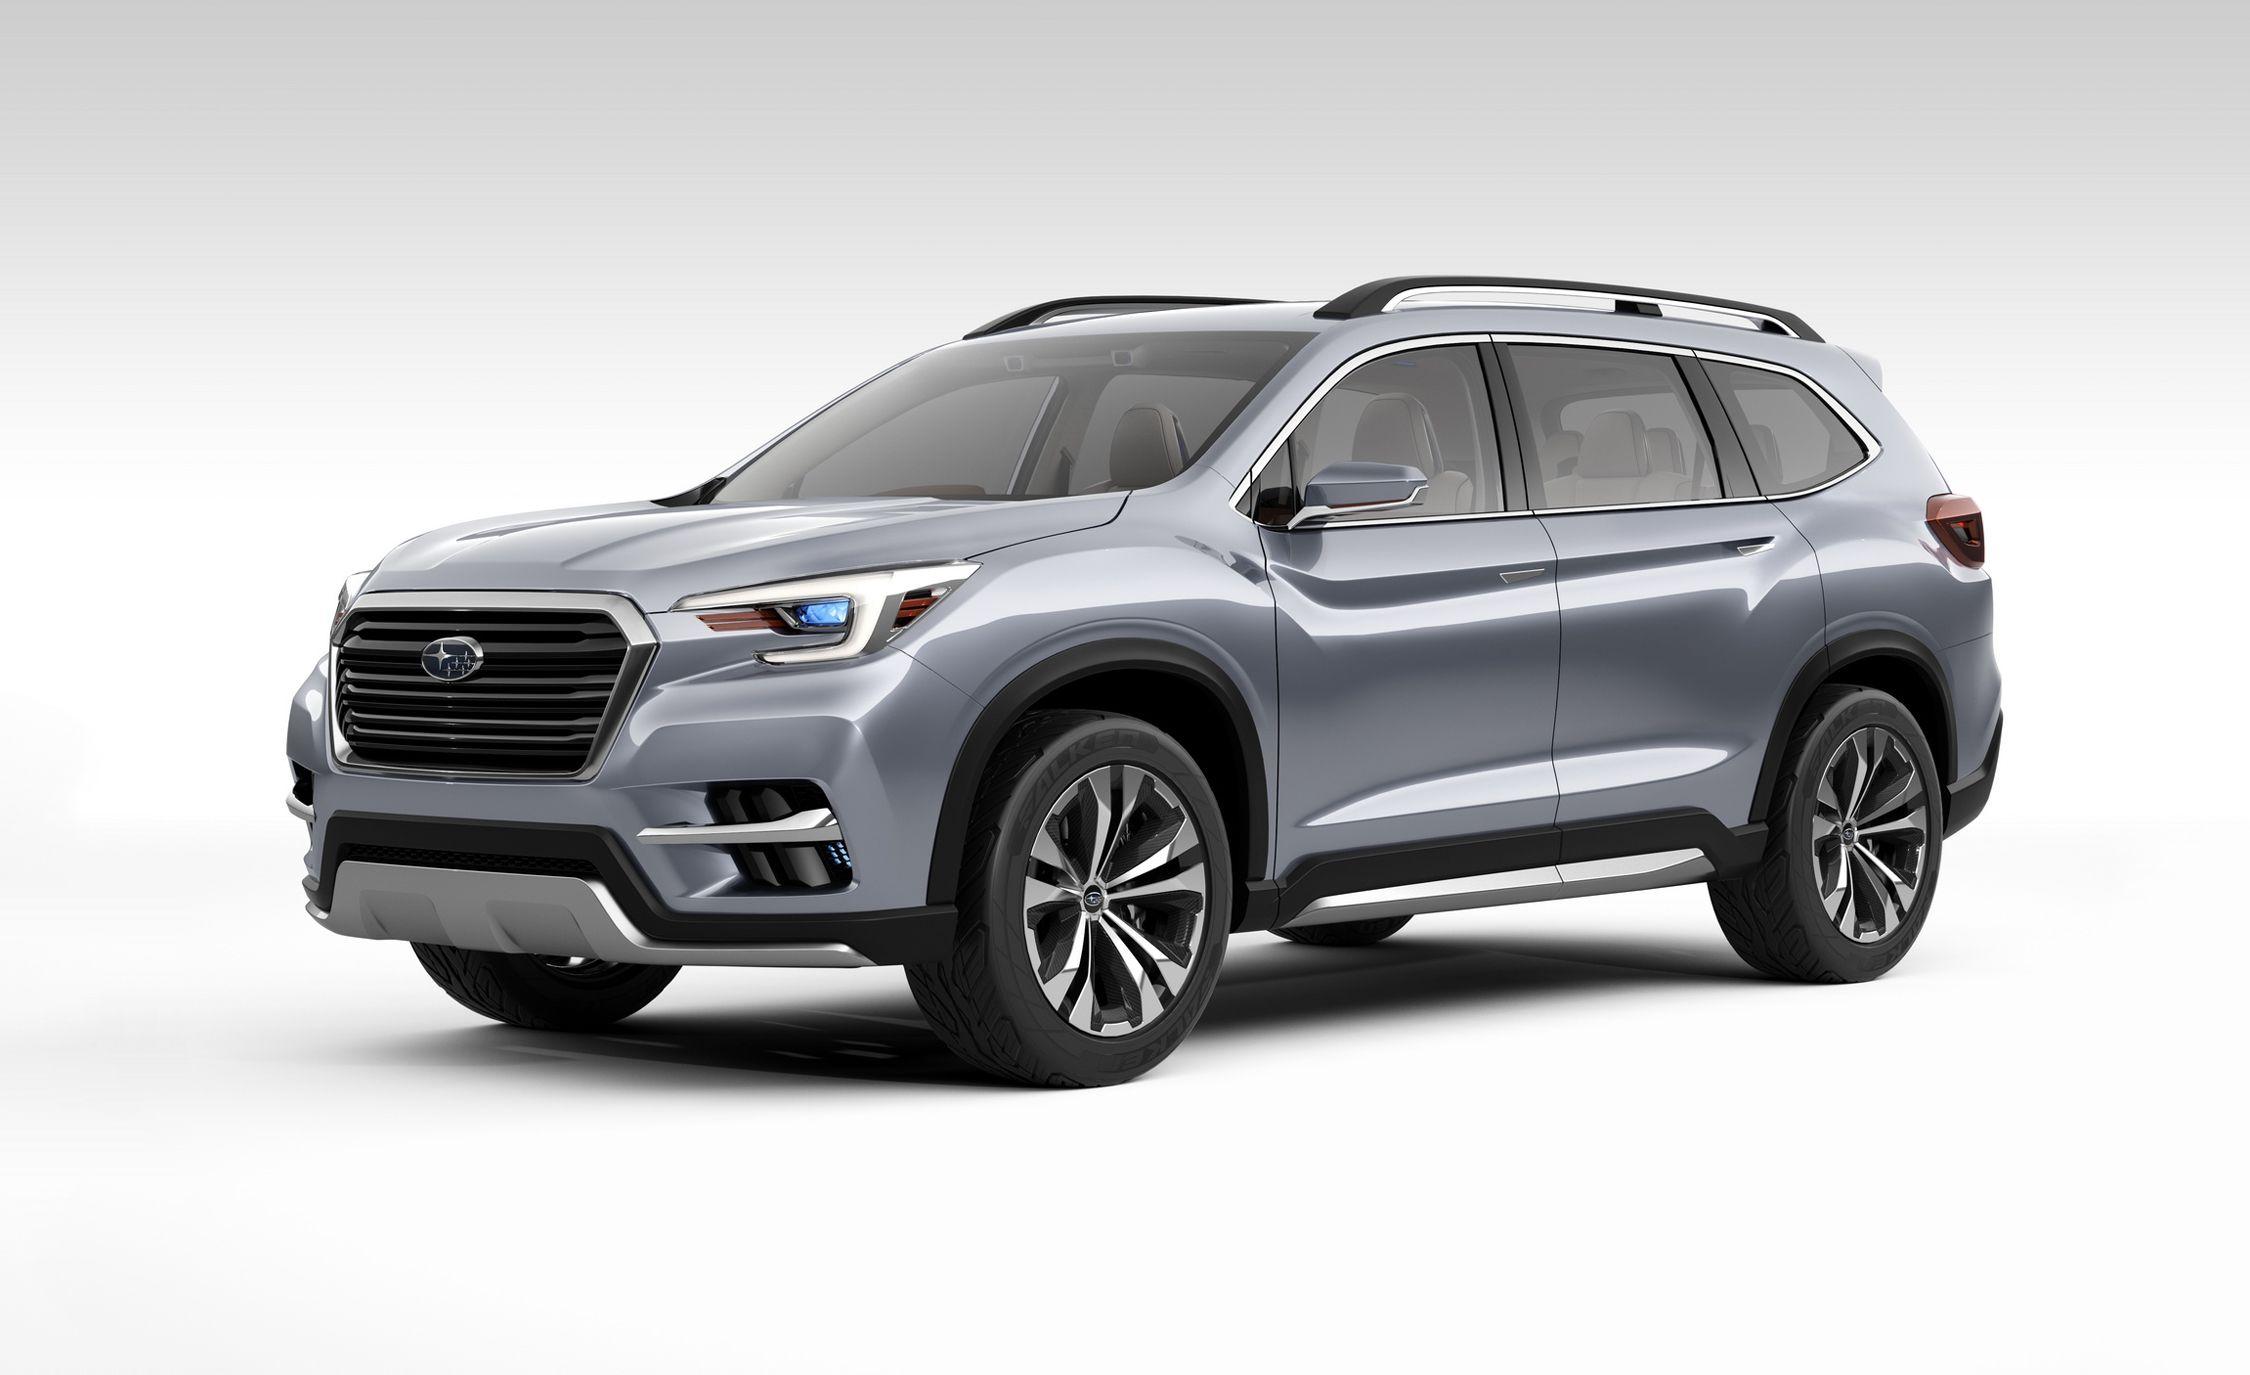 Subaru Ascent Concept: Previewing Subie's Three-Row SUV